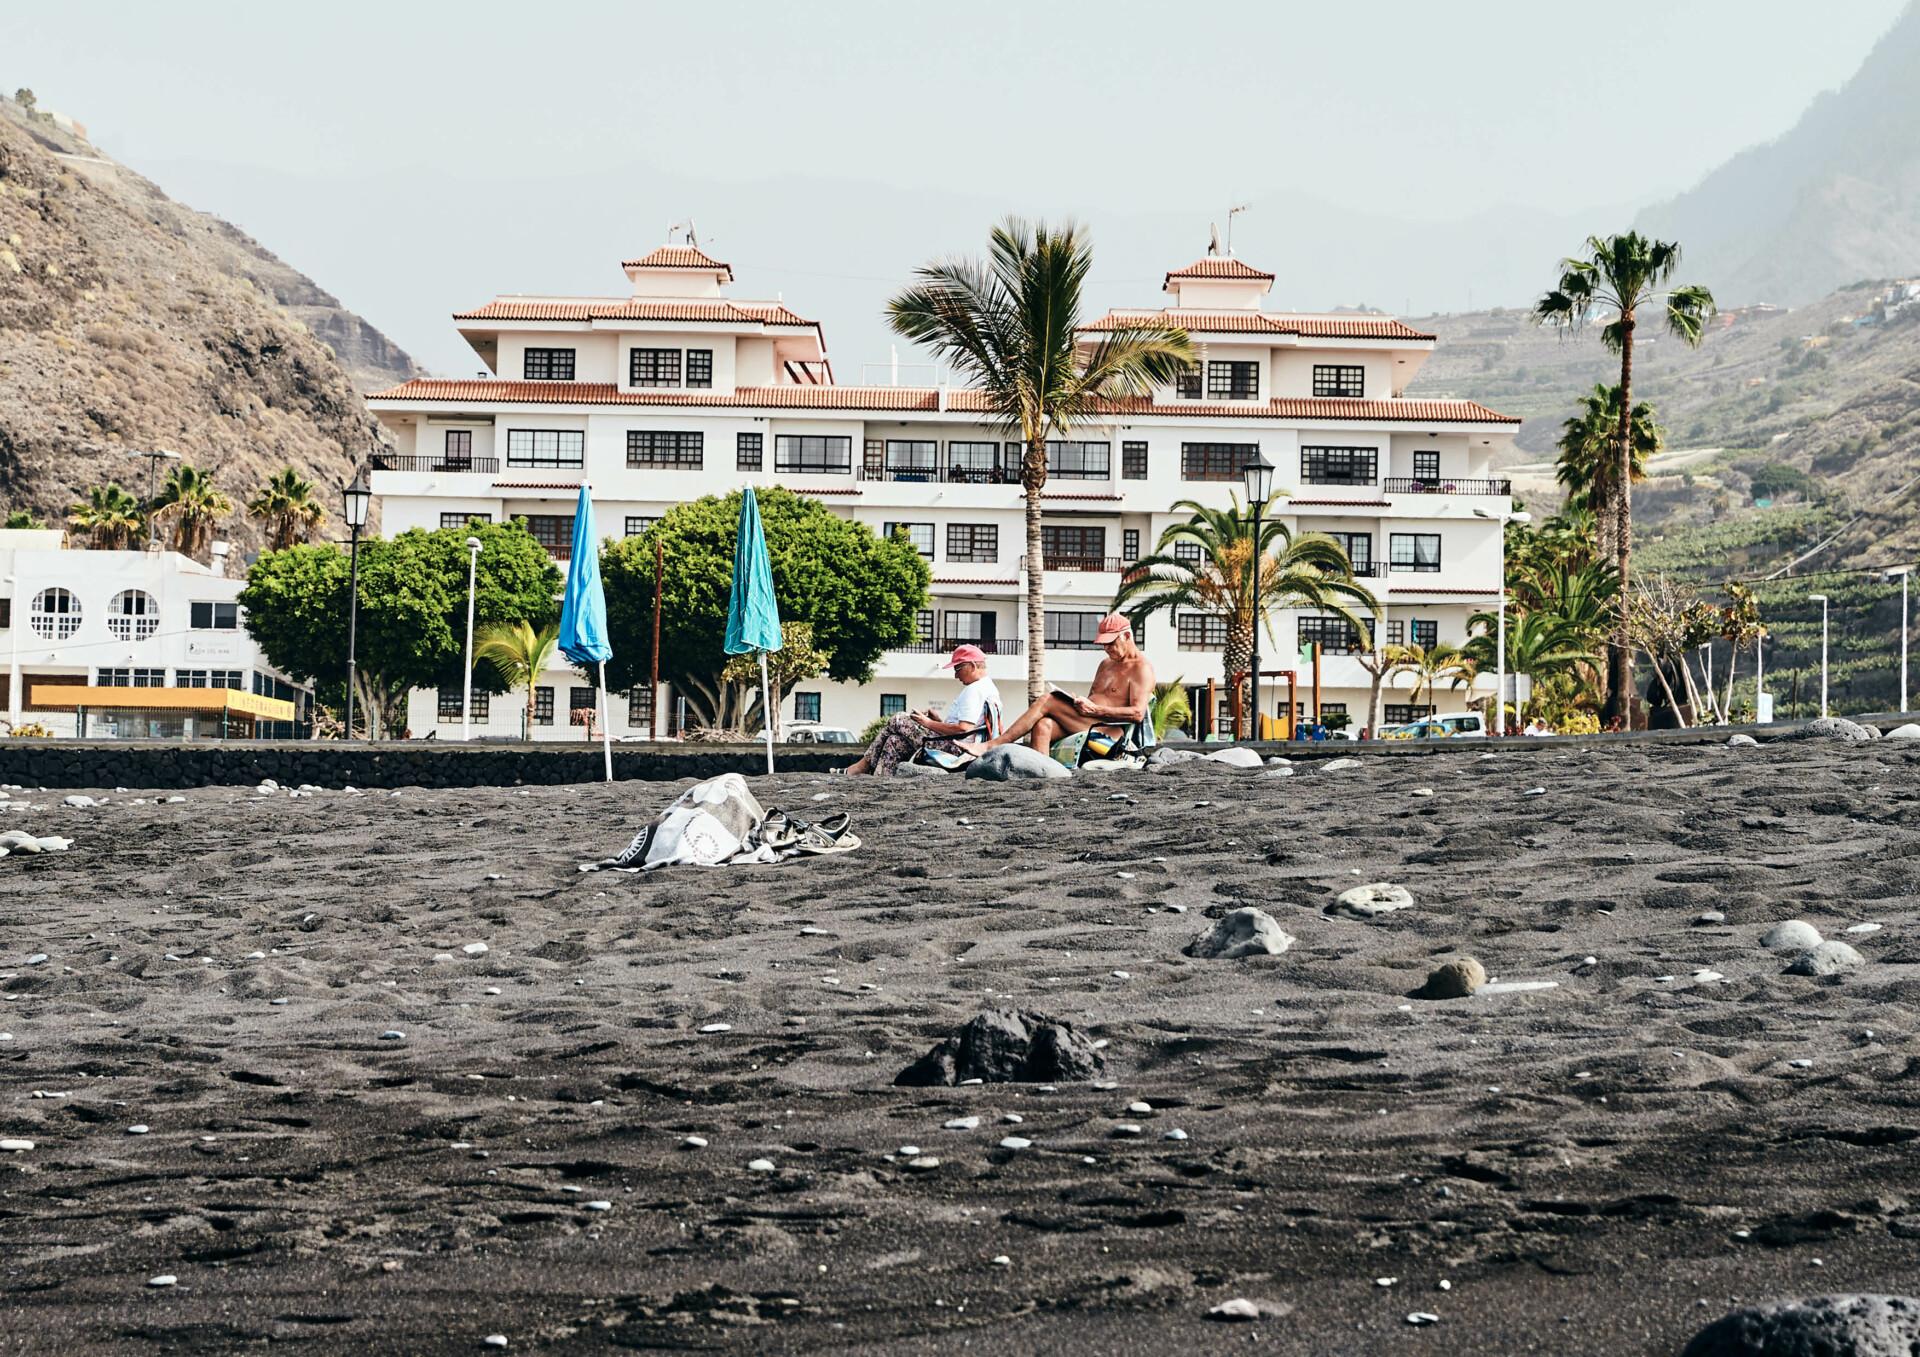 CAROLIN WINDEL La Palma, STERN/GEOSaison